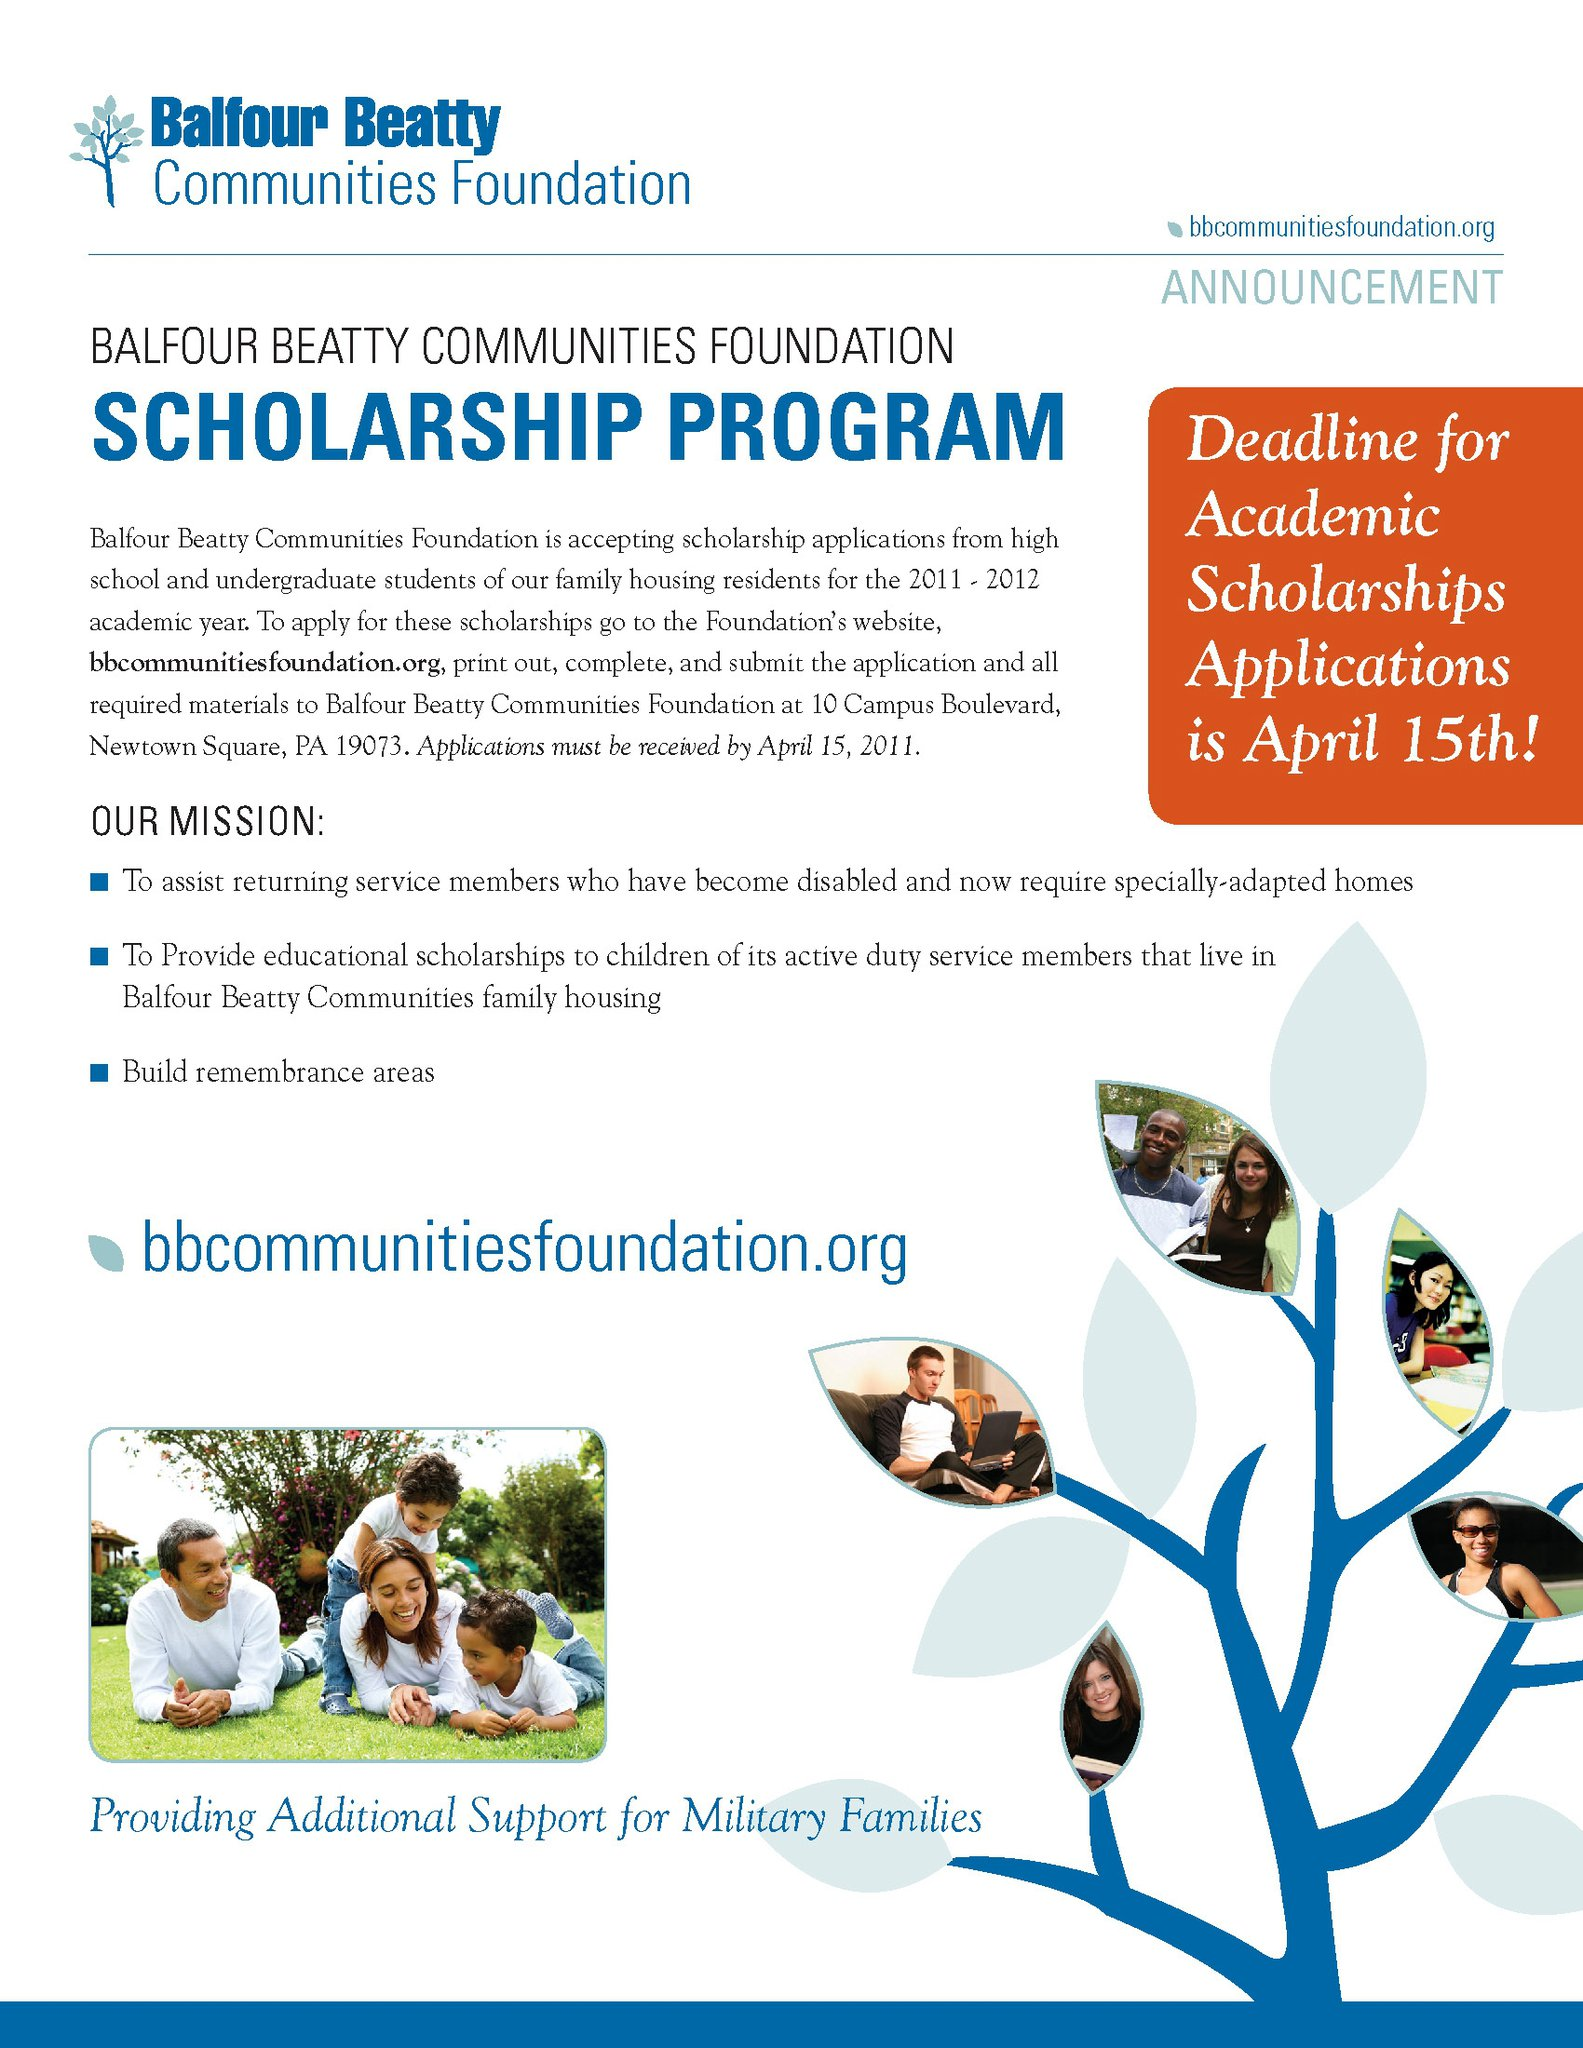 Balfour Beatty (Housing) is Giving Scholarships!